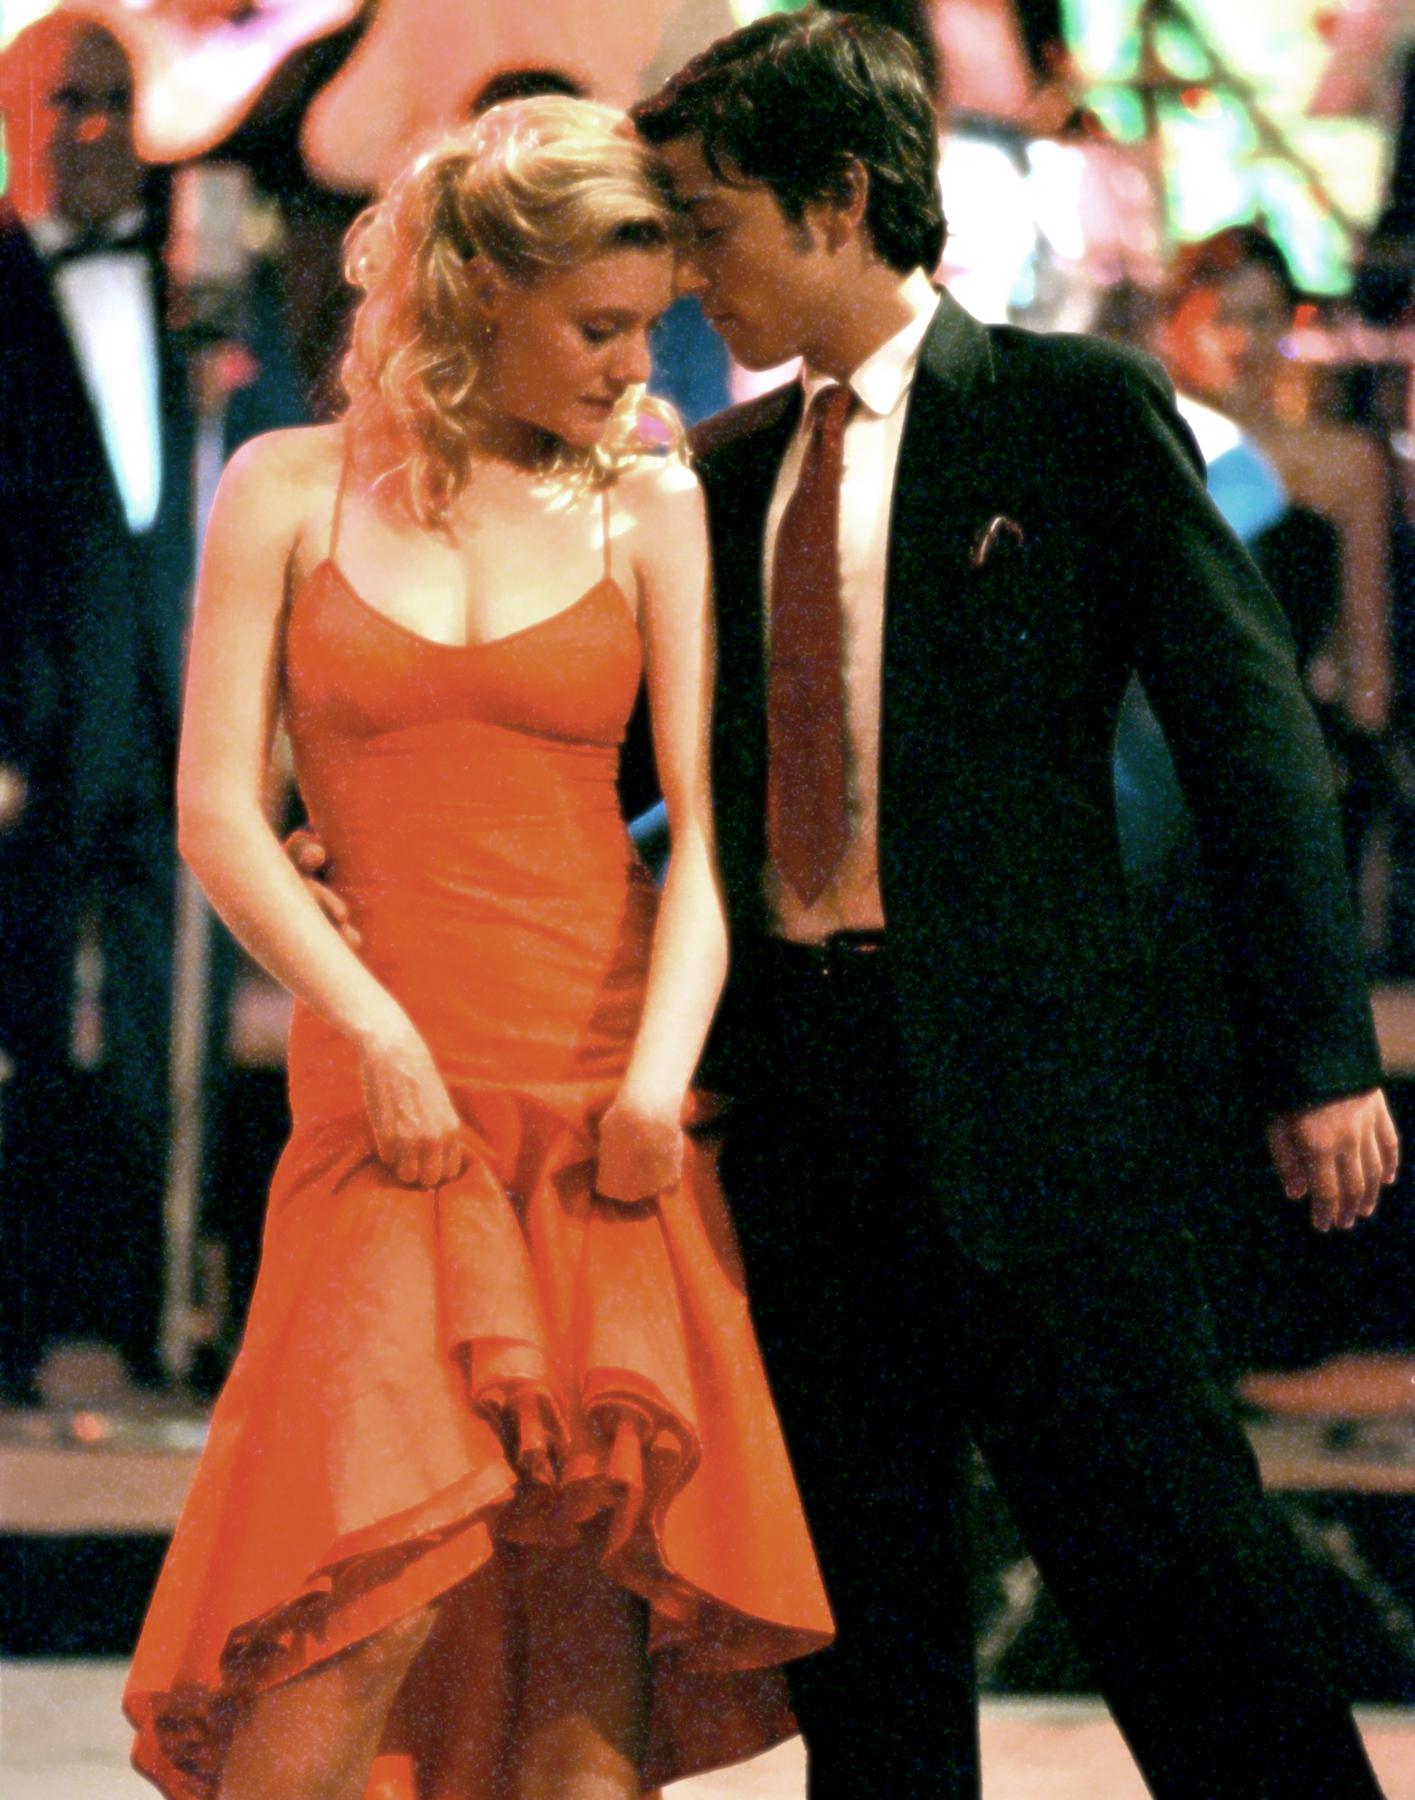 Romola Garai and Diego Luna in 2004's Dirty Dancing: Havana Nights